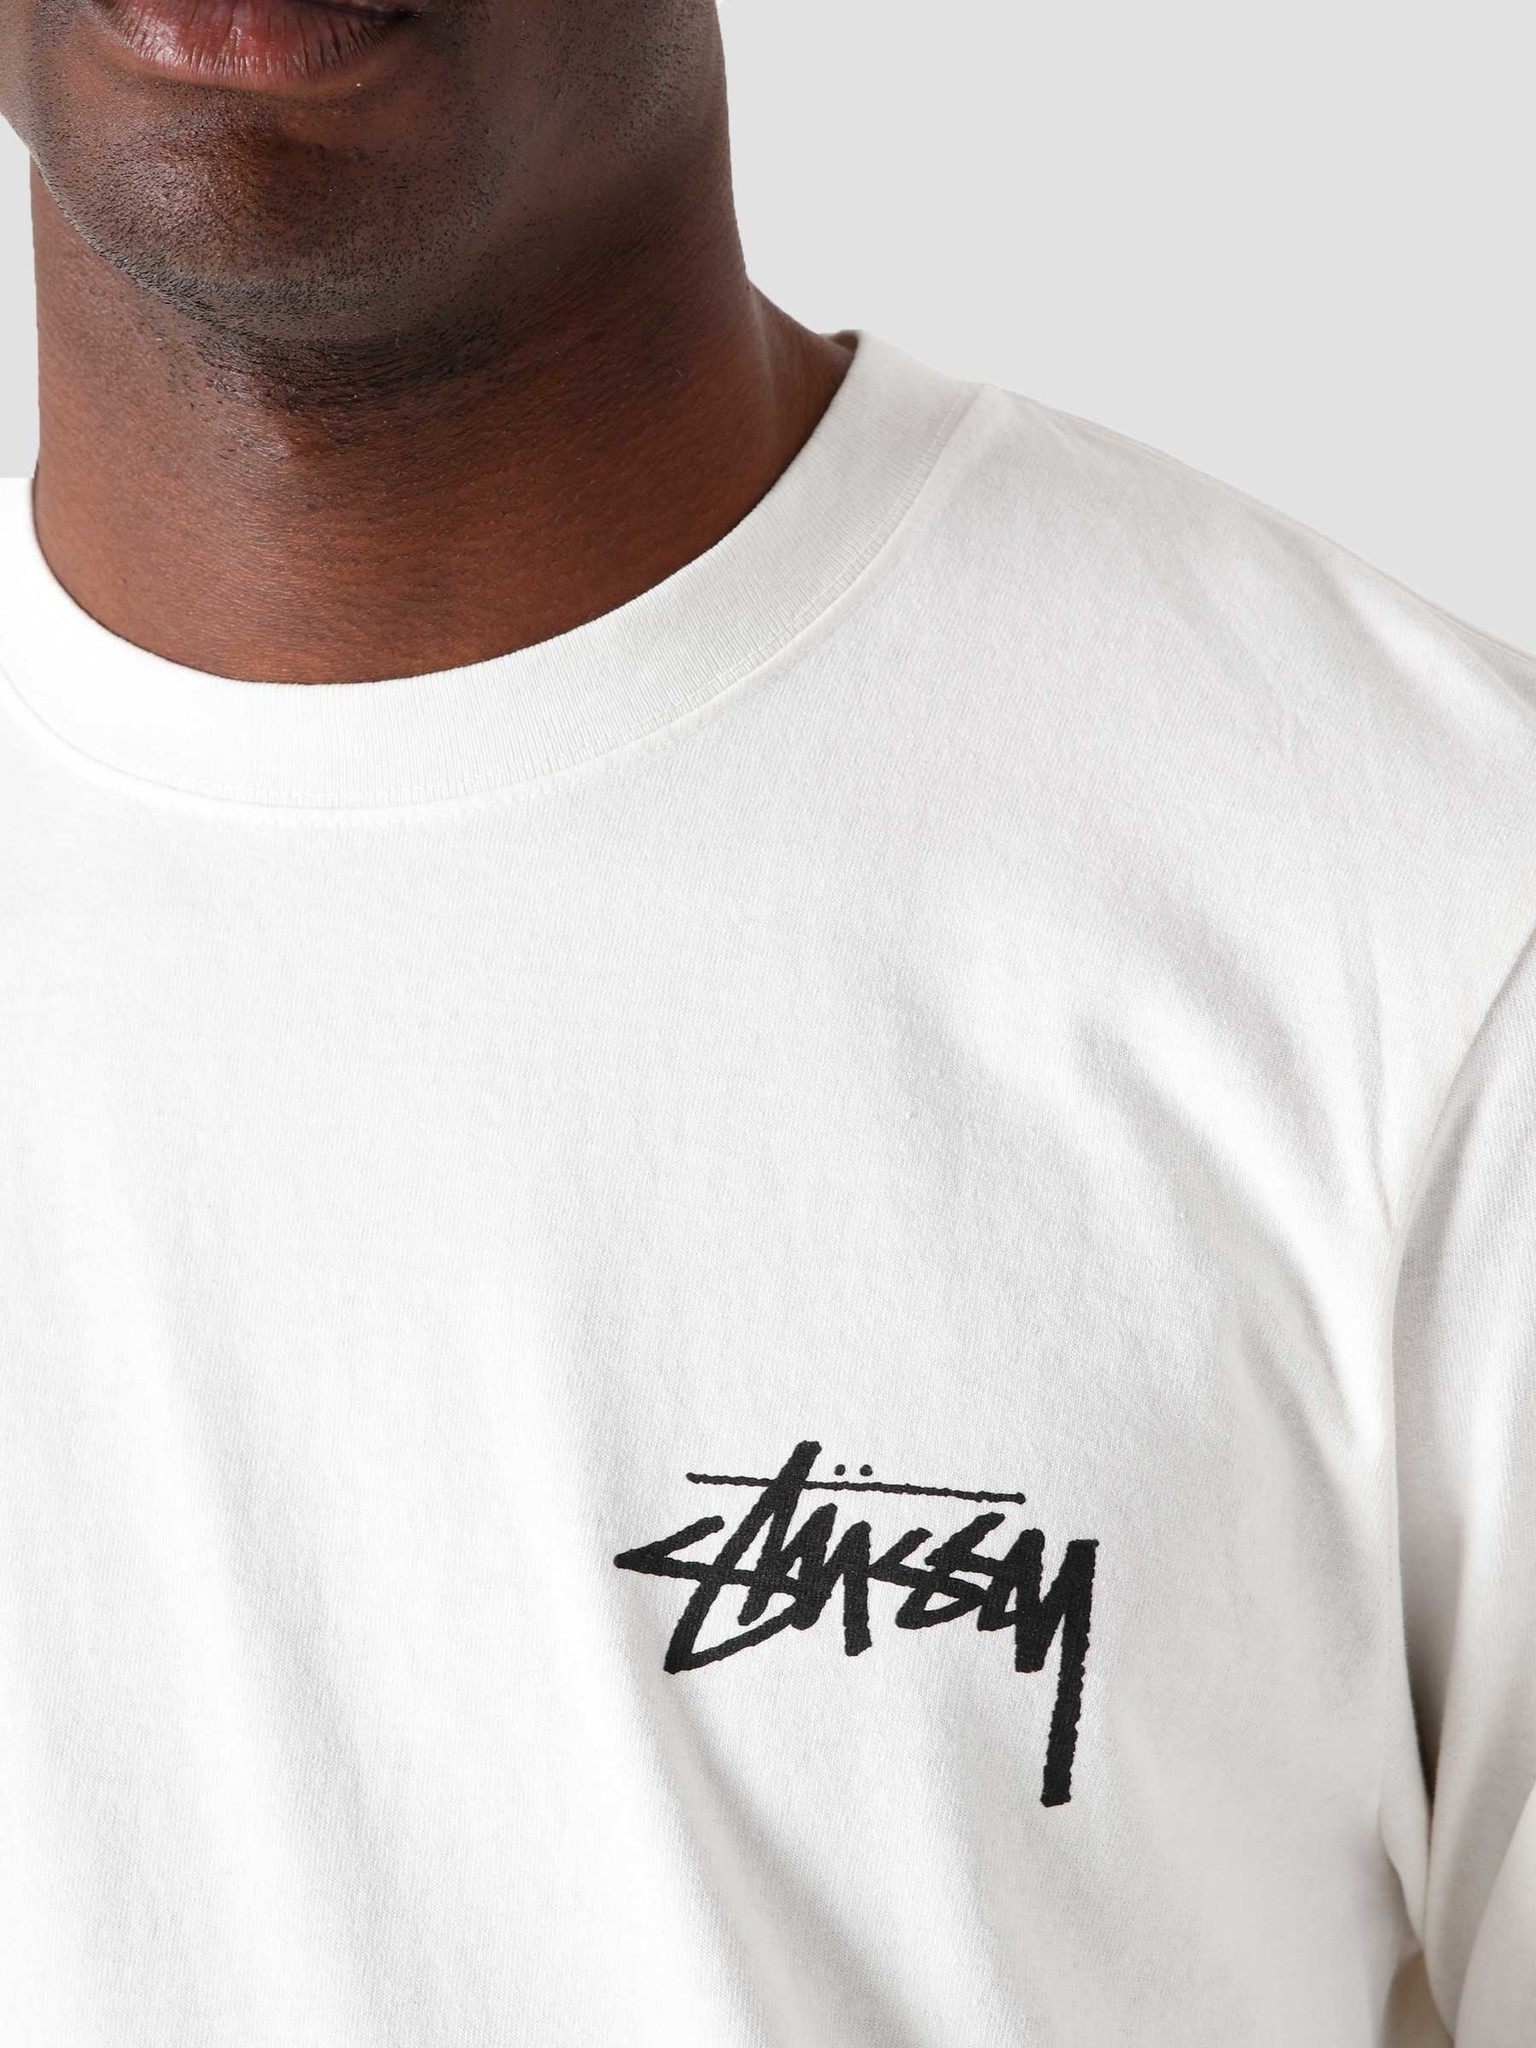 Stussy Stussy Spring Weeds Pig. Dyed Longsleeve T-Shirt Natural 1994680-1002